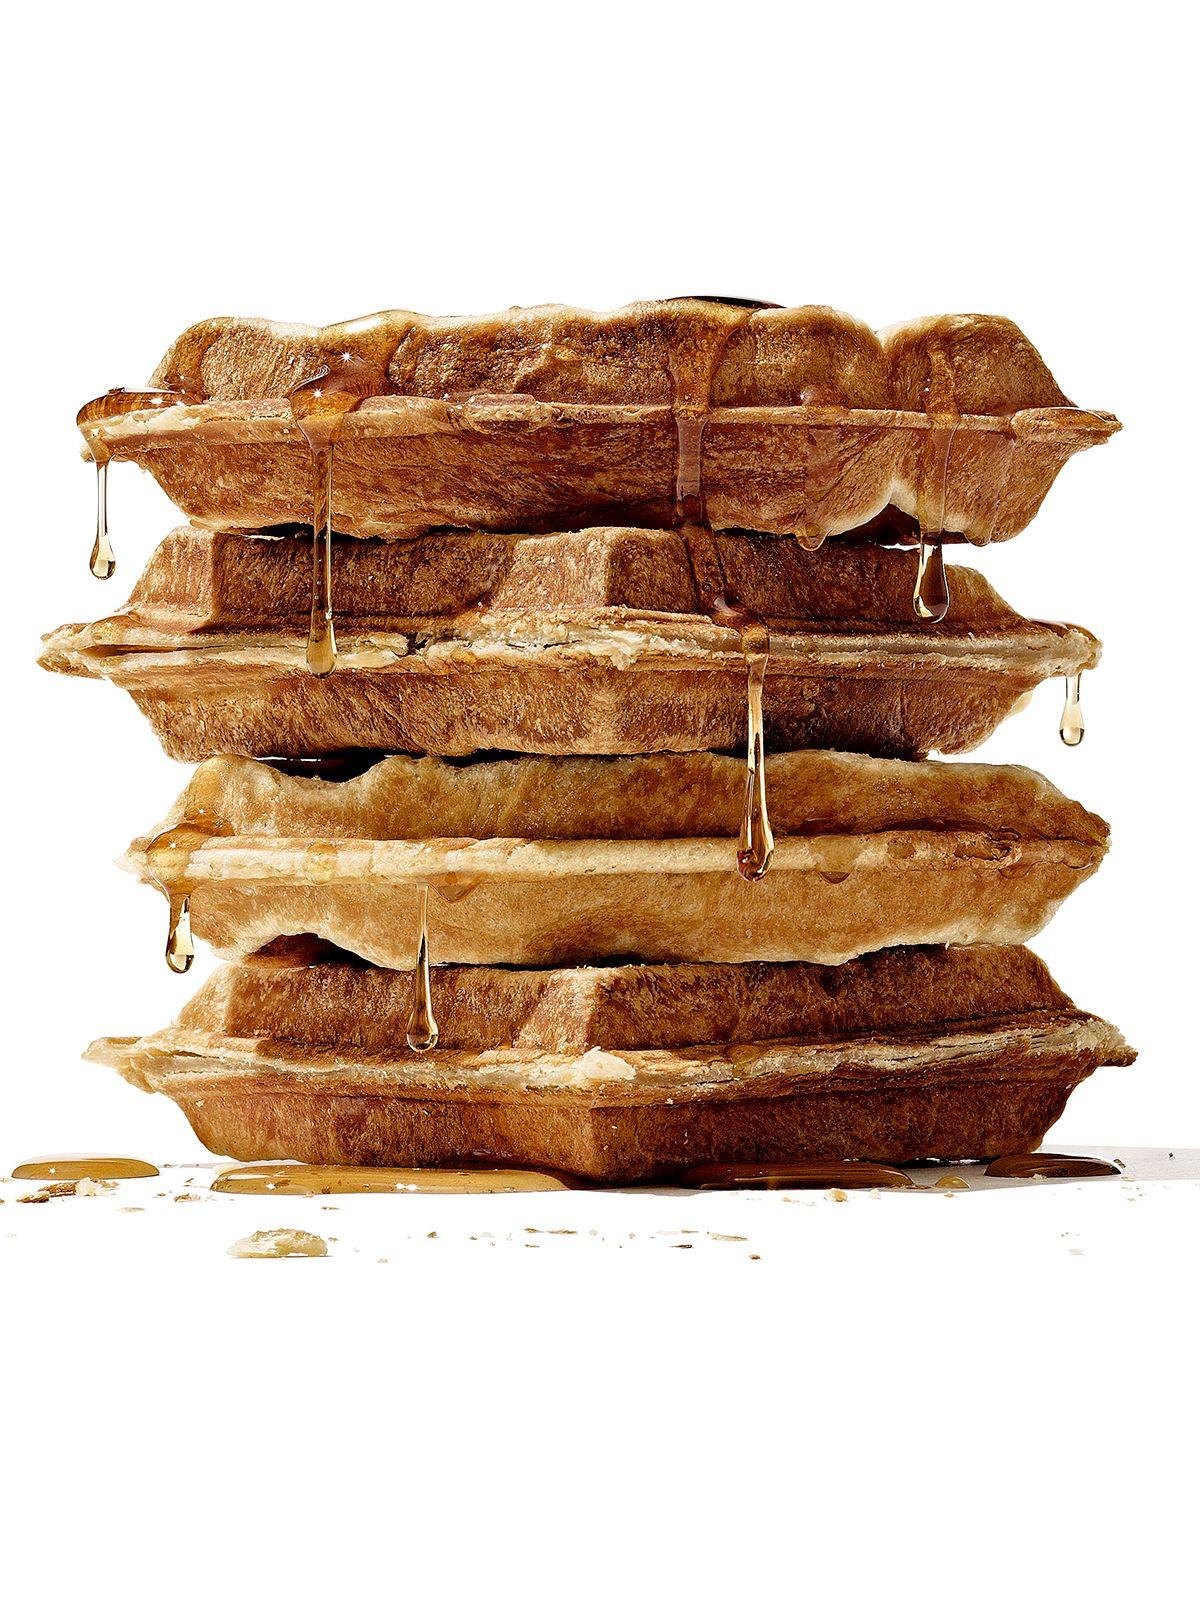 Waffles01_Workbook.jpg